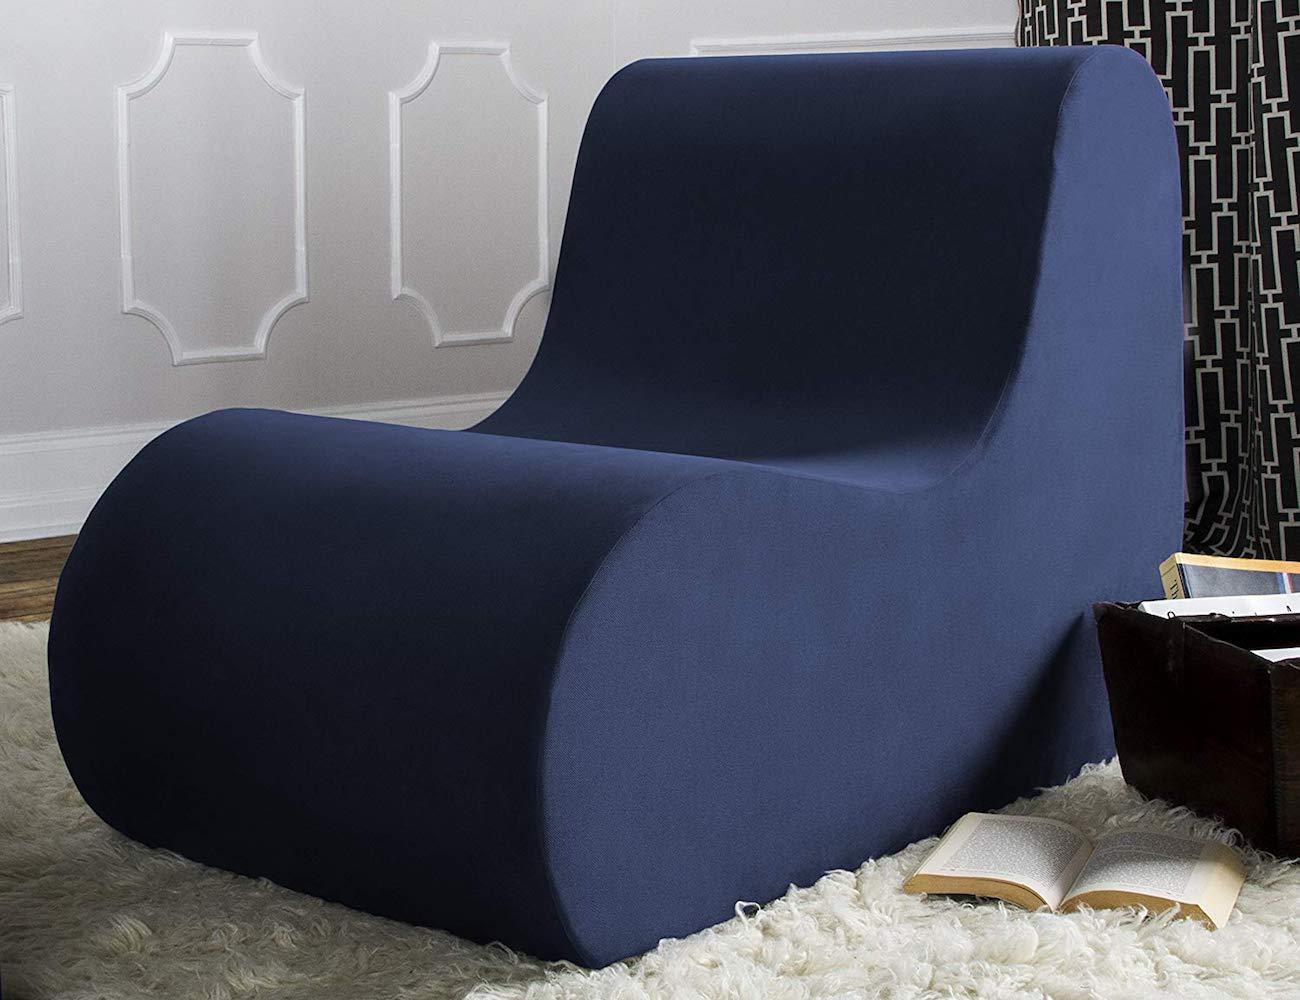 Jaxx Midtown Modern Accent Chair